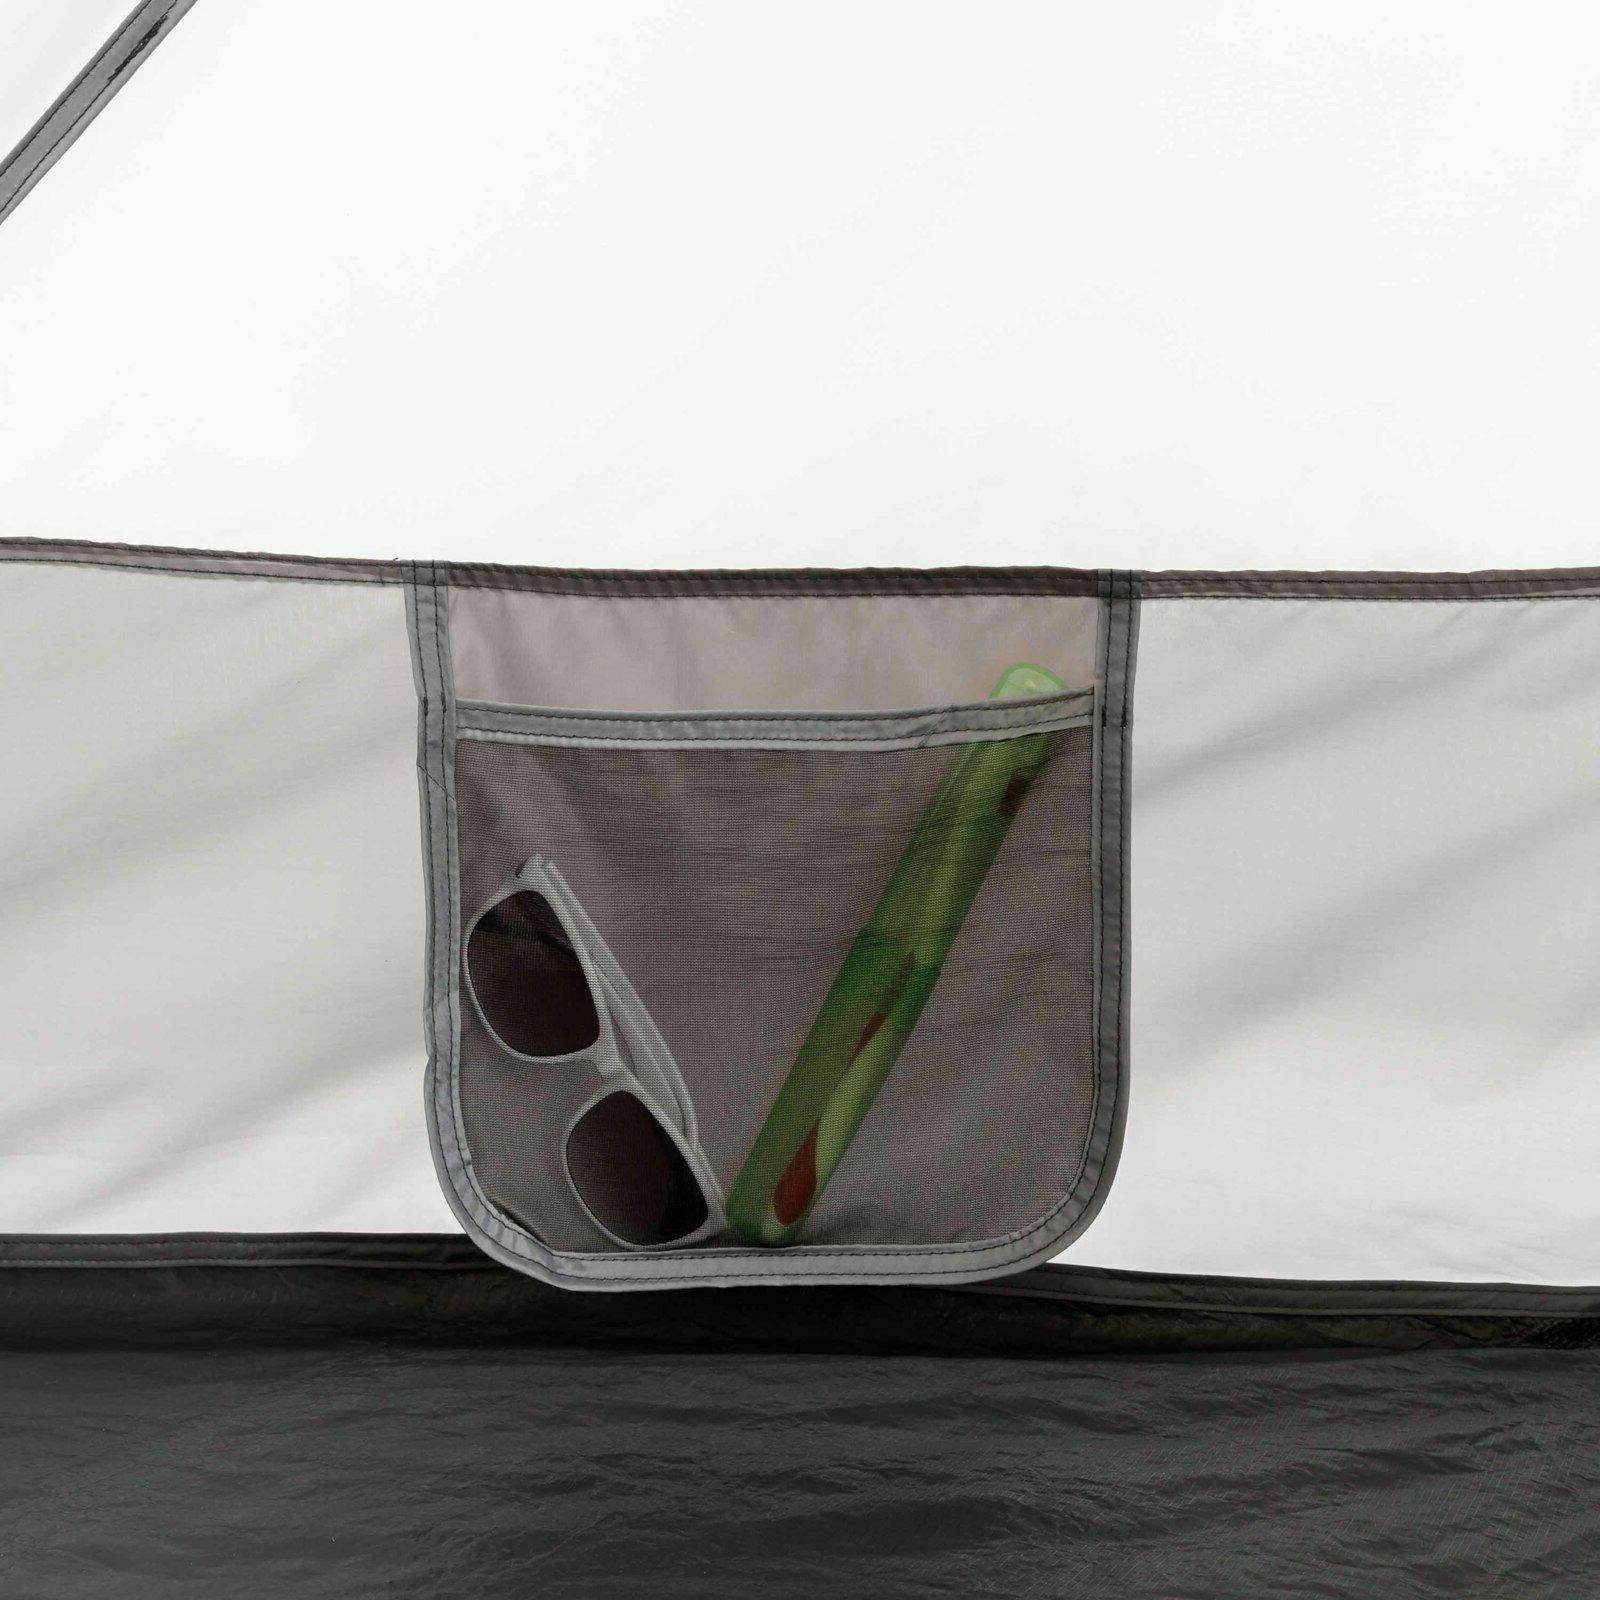 Ozark Kit with Tent, and Sleeping